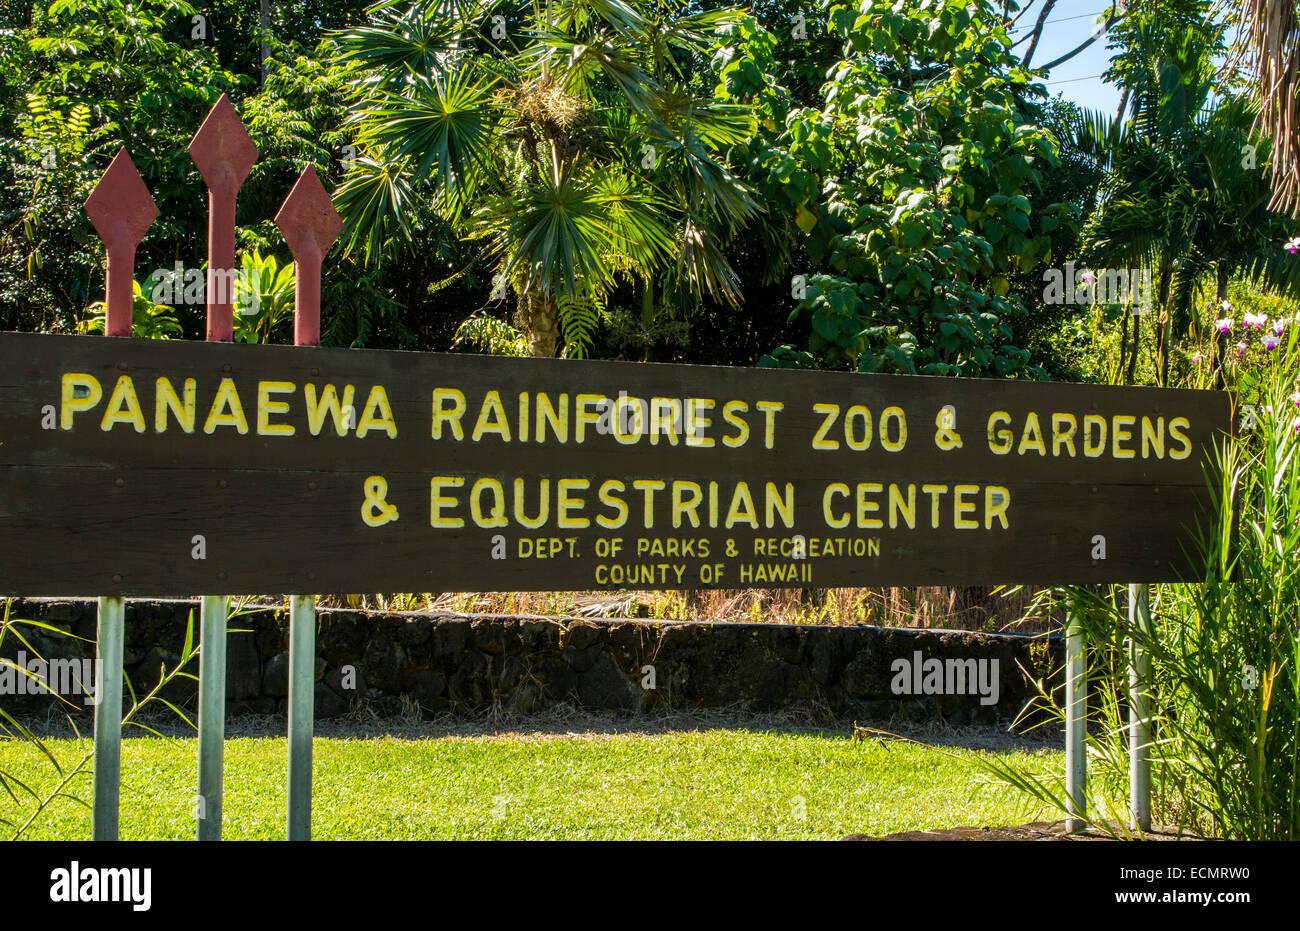 Hilo Hawaii Big Island Panaewa Rain Forest Zoo and Gardens sign green peaceful - Stock Image